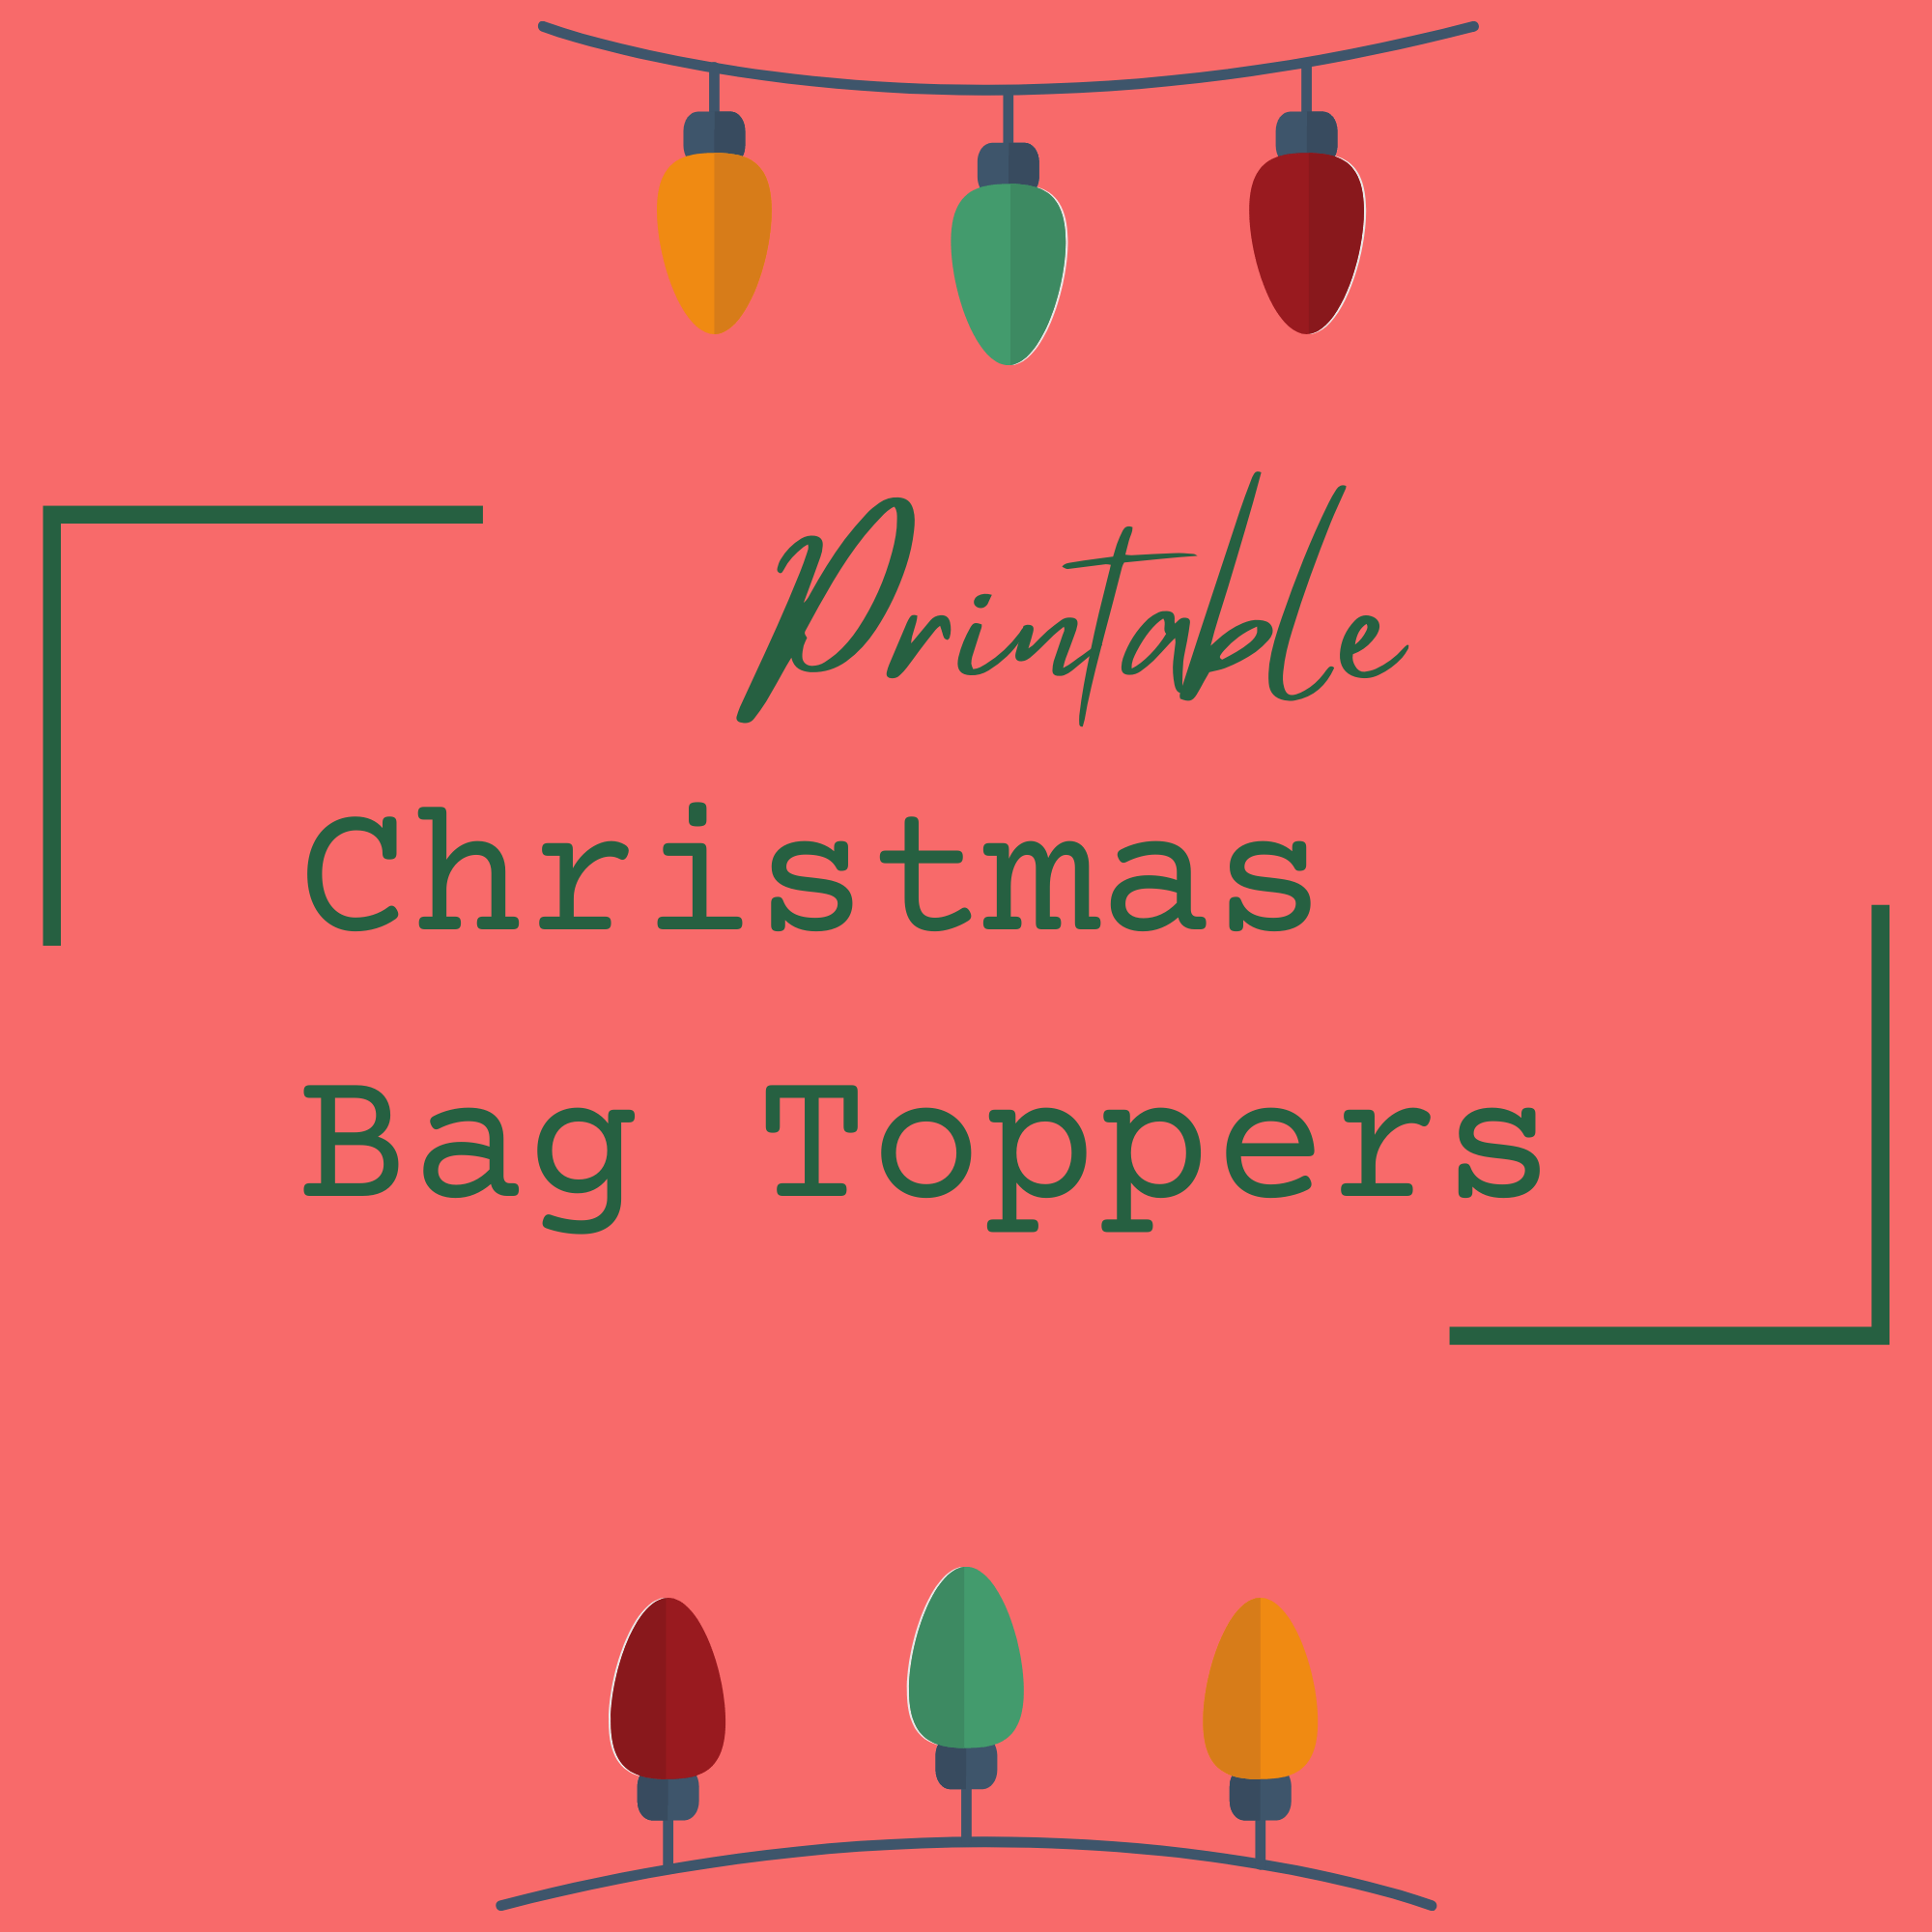 "<span itemprop=""name"">Cute Printable Christmas Bag Toppers</span> via @clarkscondensed"